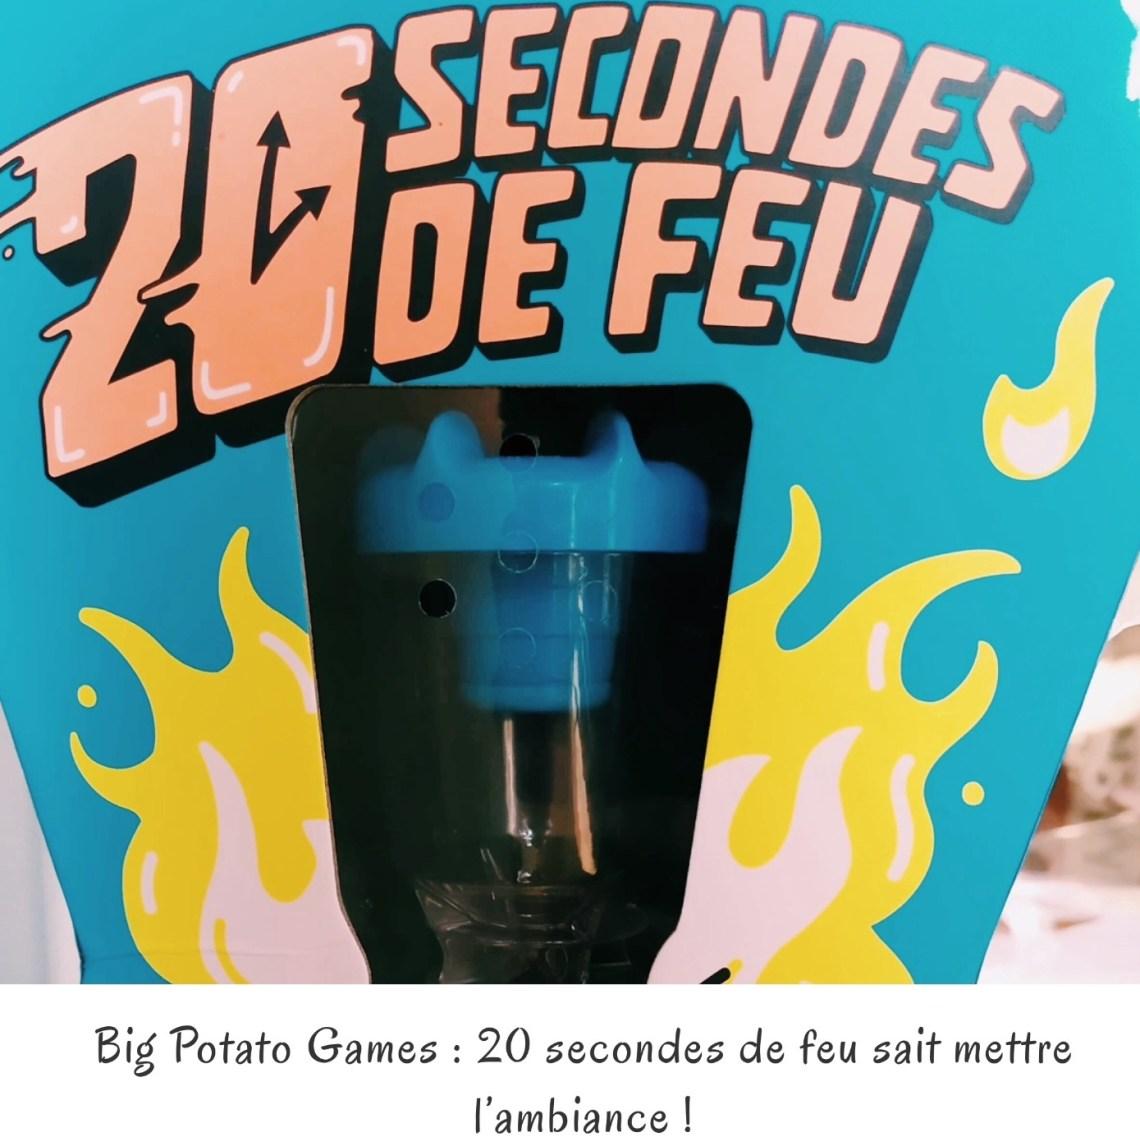 Big Potato Games : 20 secondes de feu sait mettre l'ambiance !